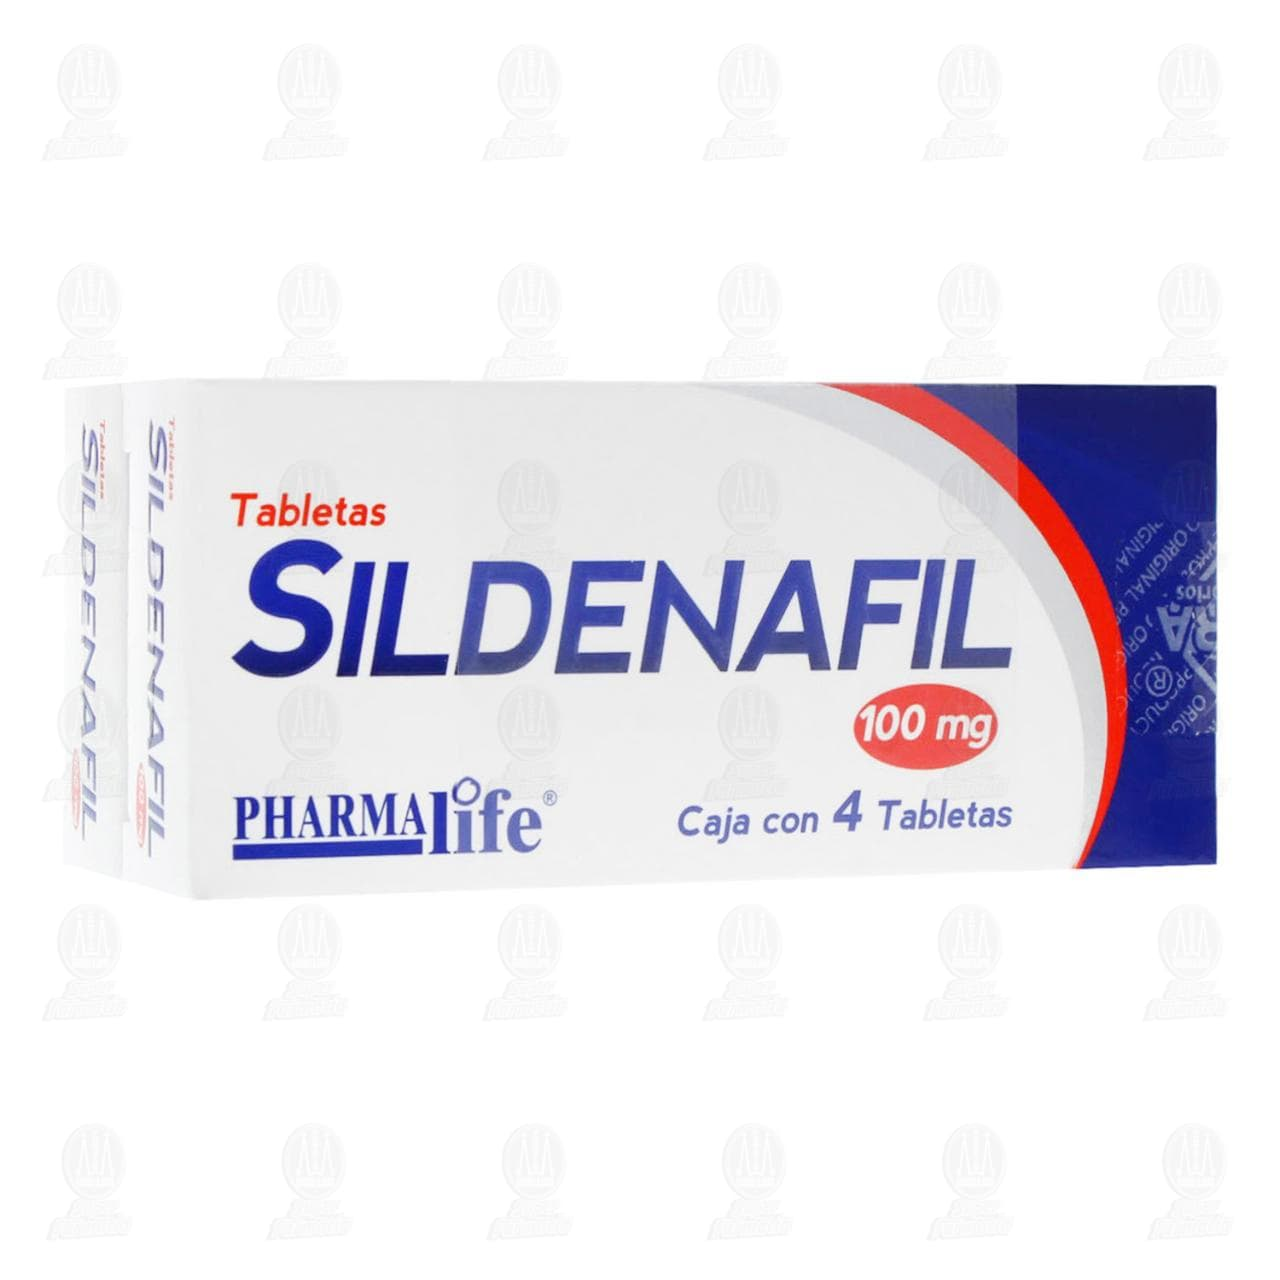 Comprar Sildenafil 100mg 8 Tabletas 2 Cajas de 4 Tabletas c/u Pharmalife en Farmacias Guadalajara